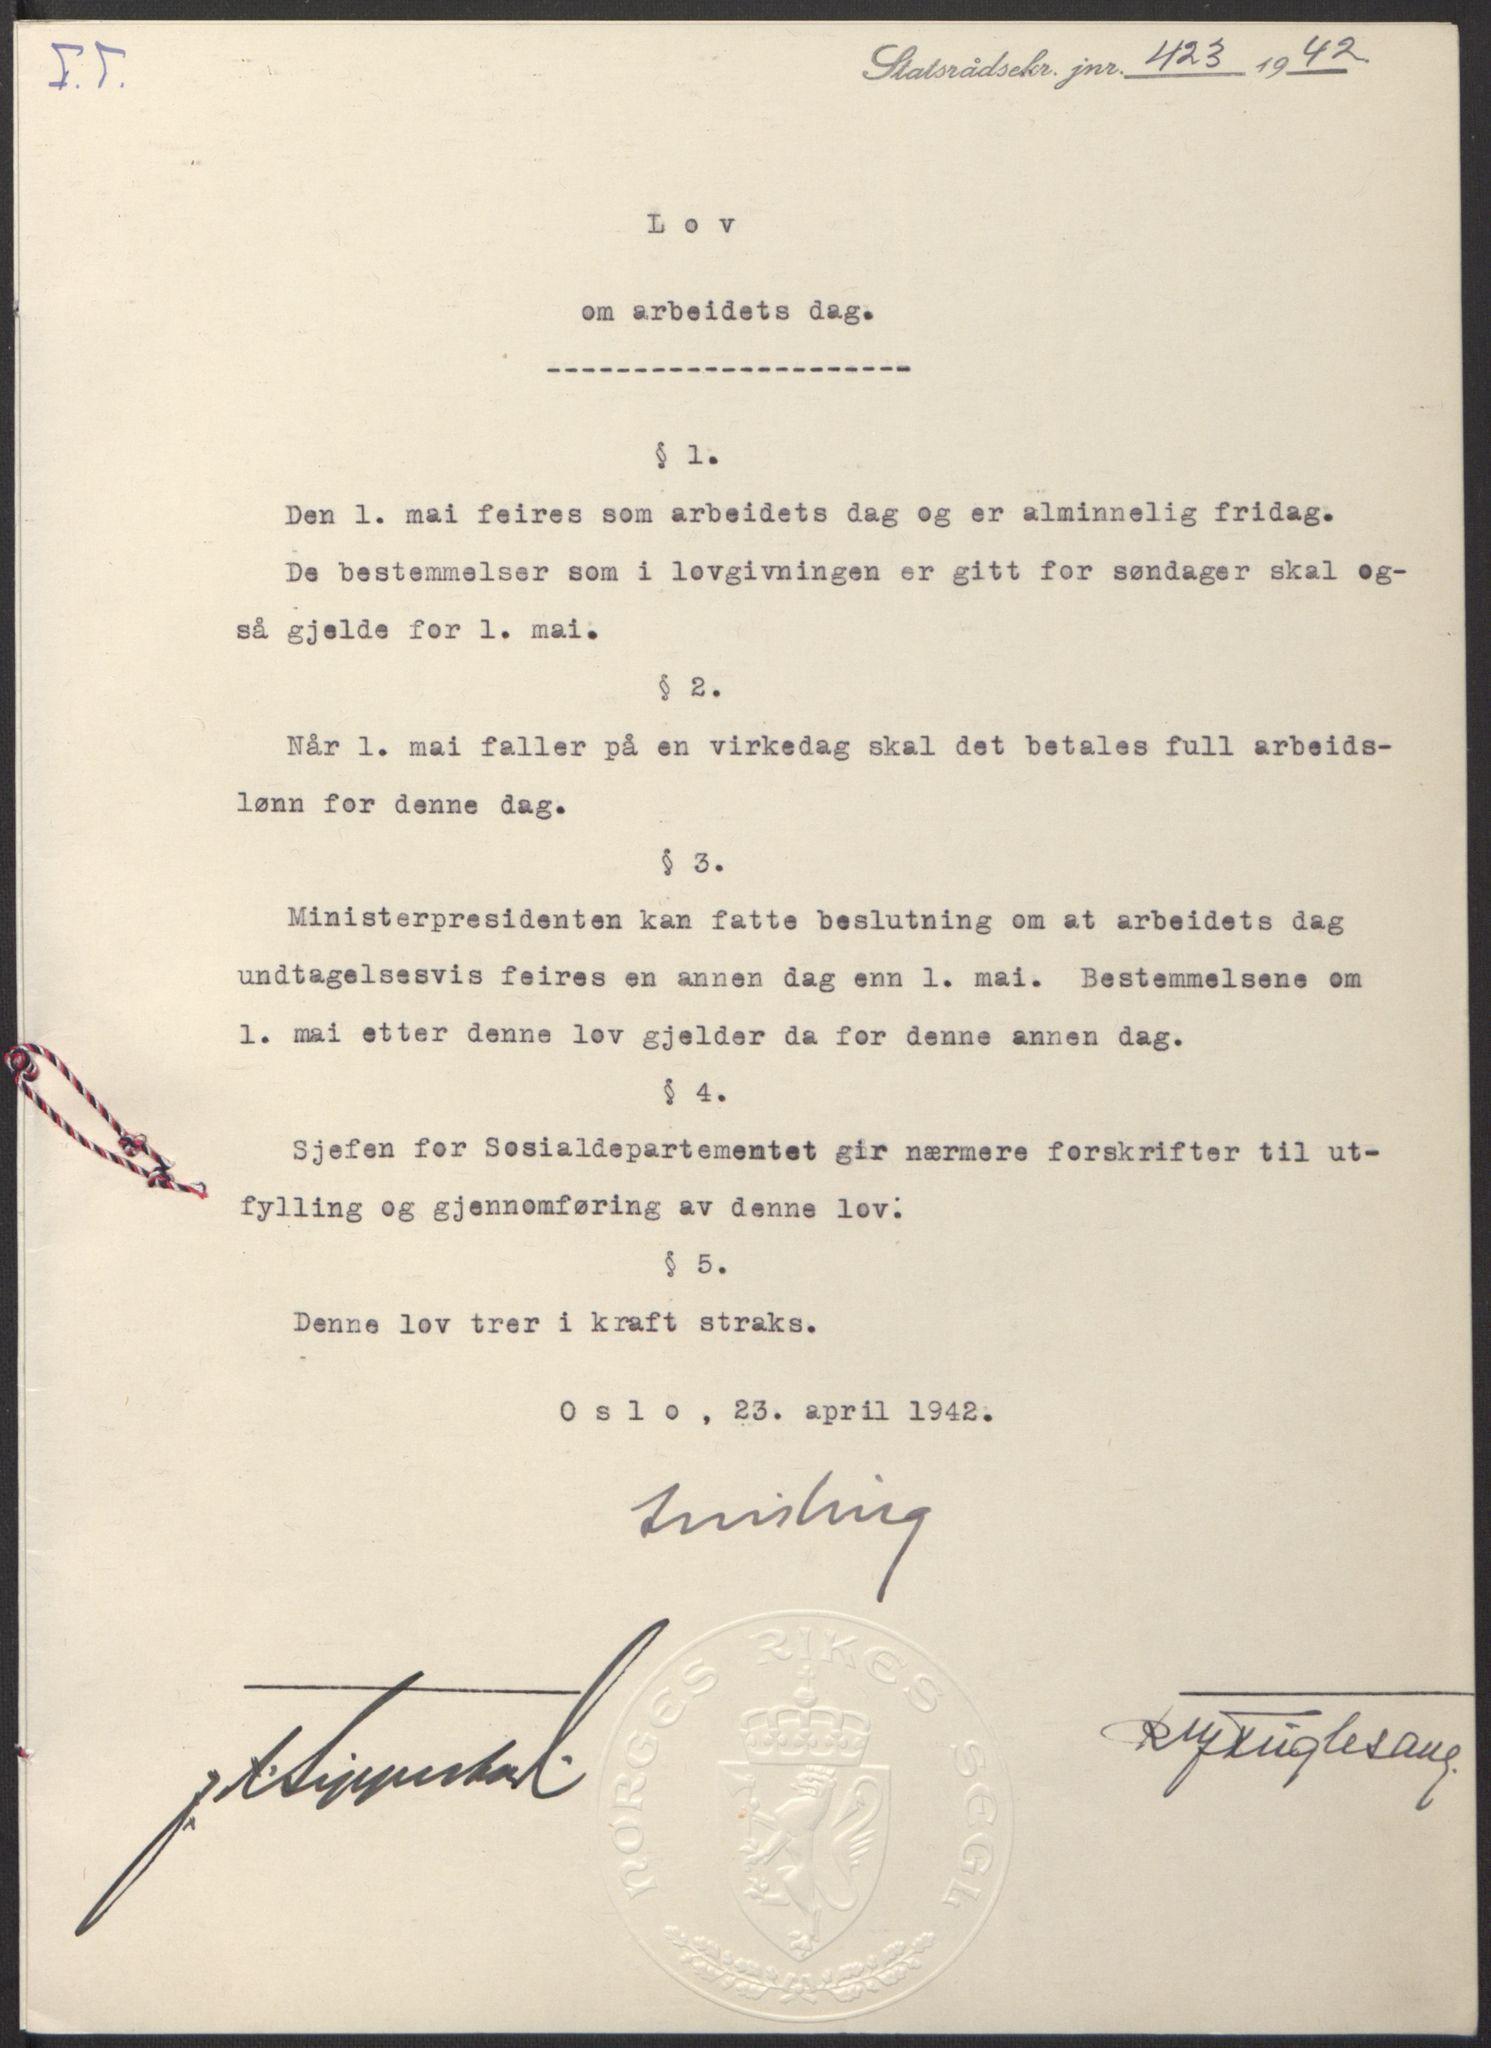 RA, NS-administrasjonen 1940-1945 (Statsrådsekretariatet, de kommisariske statsråder mm), D/Db/L0097: Lover I, 1942, s. 305